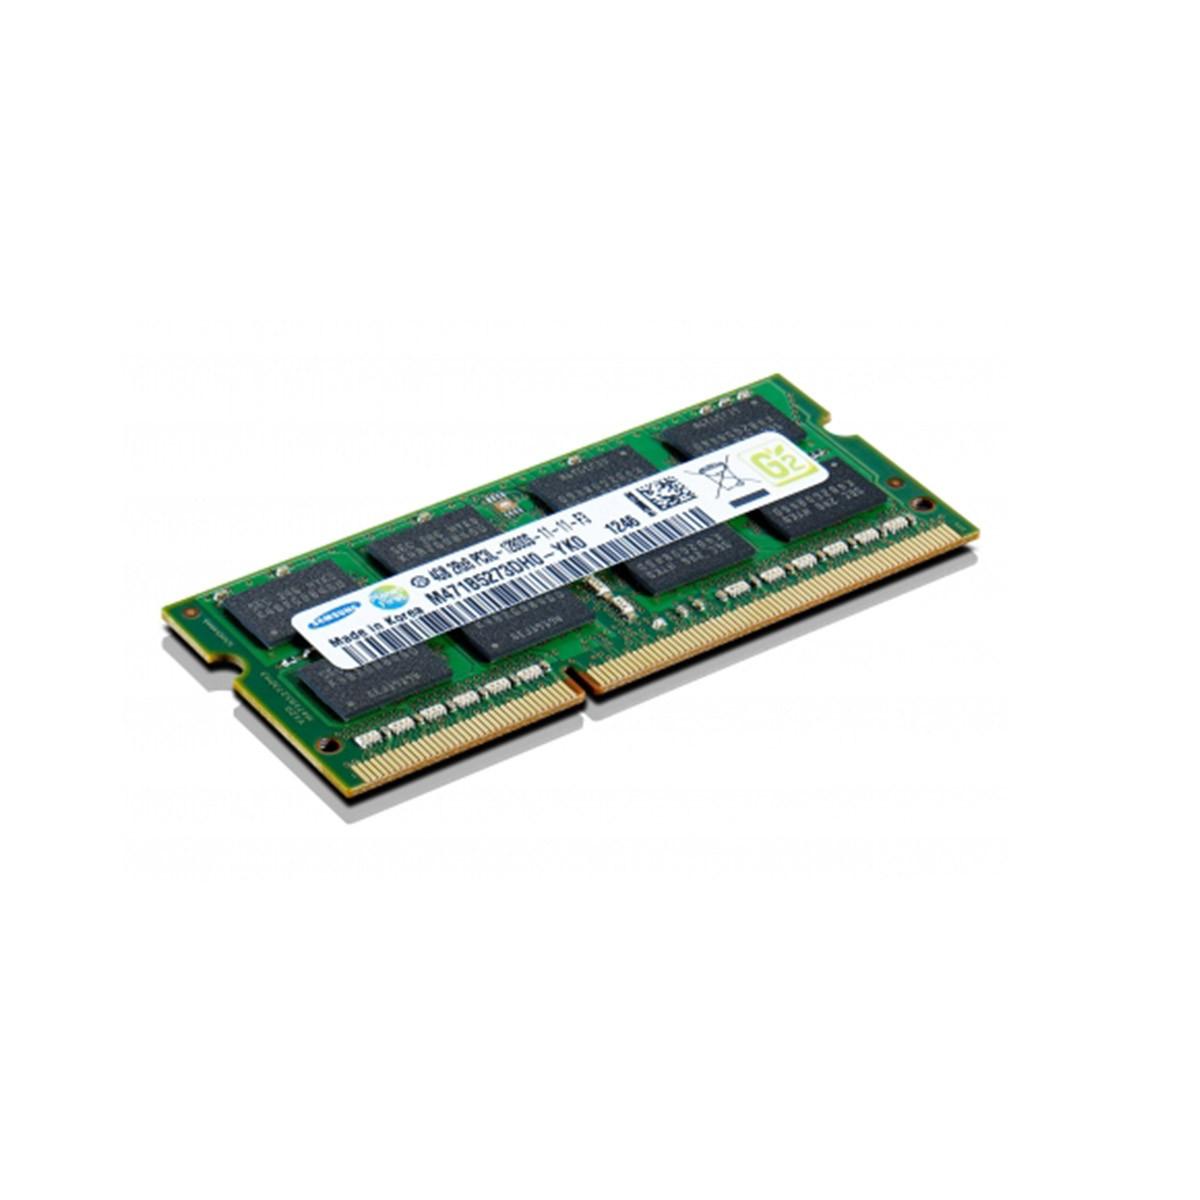 (EOL) LENOVO® 16GB DDR3L 1600 (PC3 12800) SODIMM Memory Arbeitsspeicher